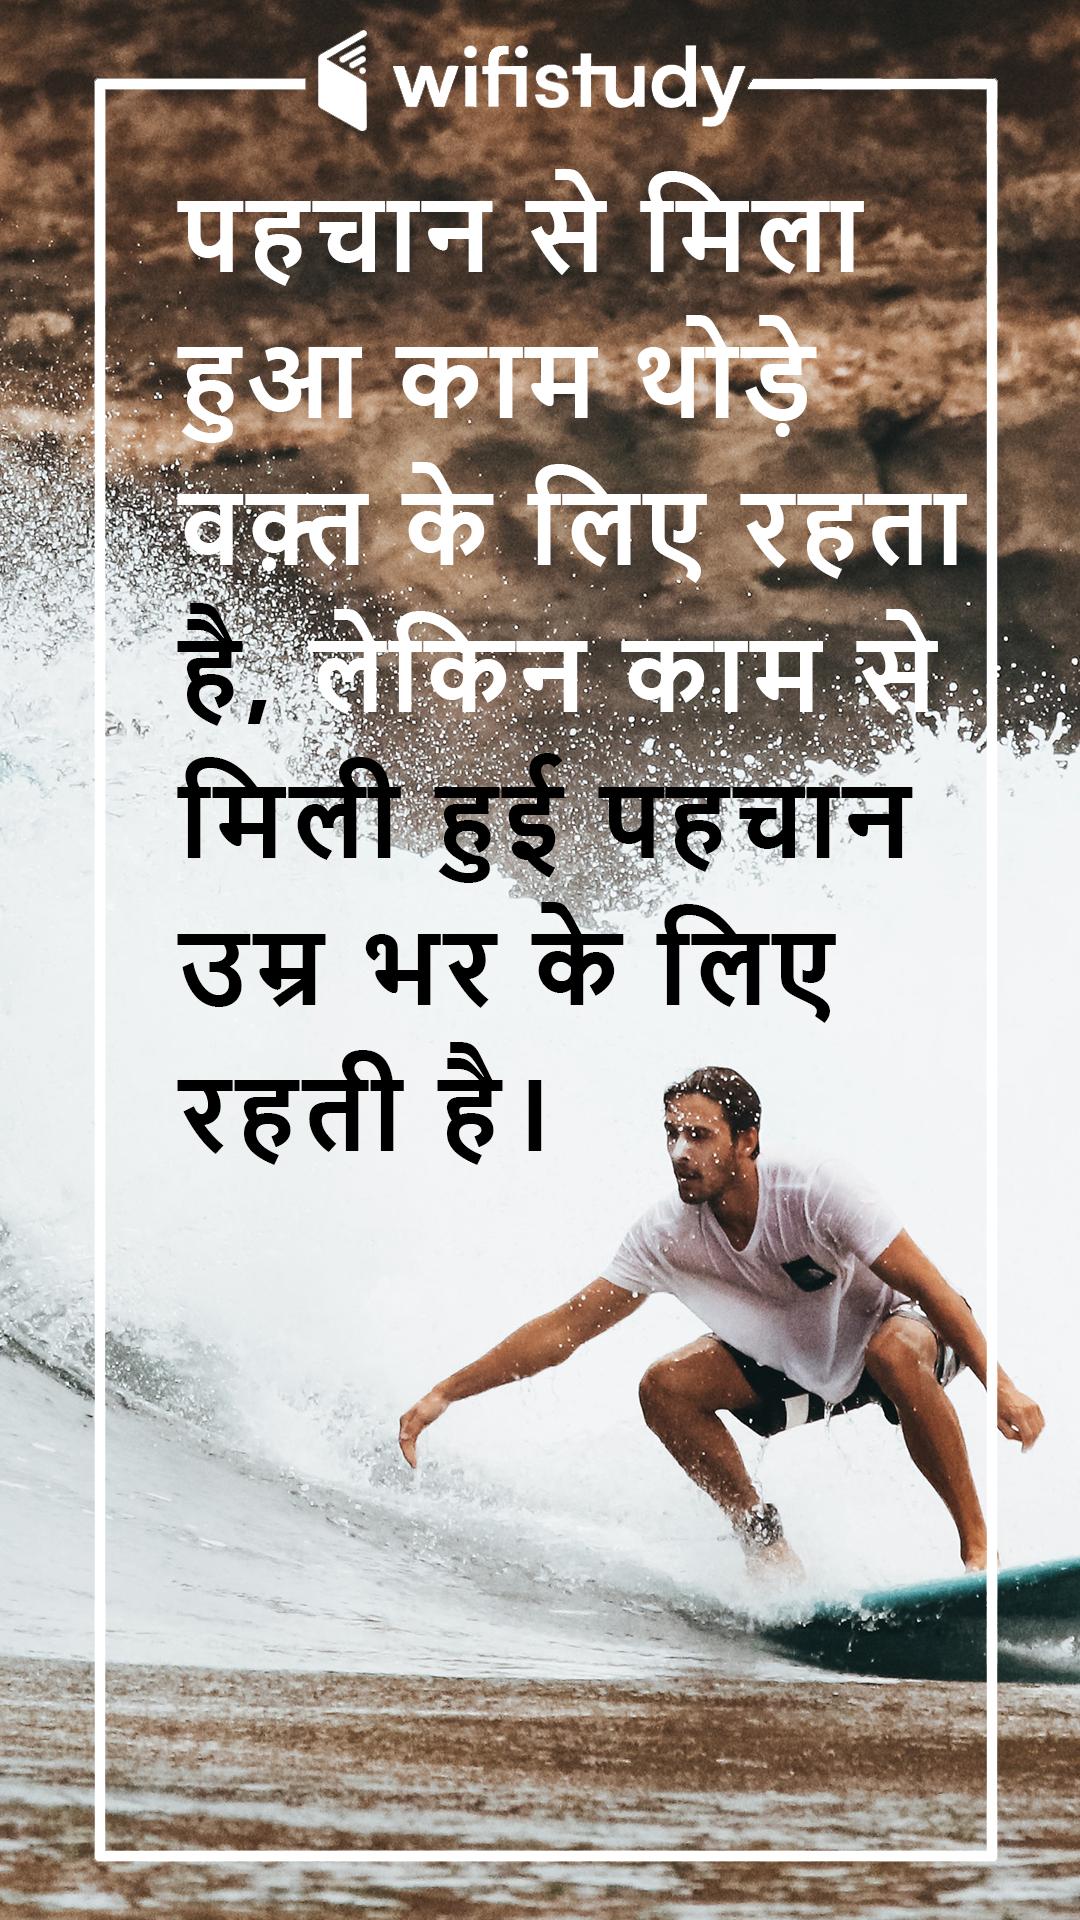 Motivational Quotes Hindi Insightful Quotes Good Life Quotes Motivatonal Quotes